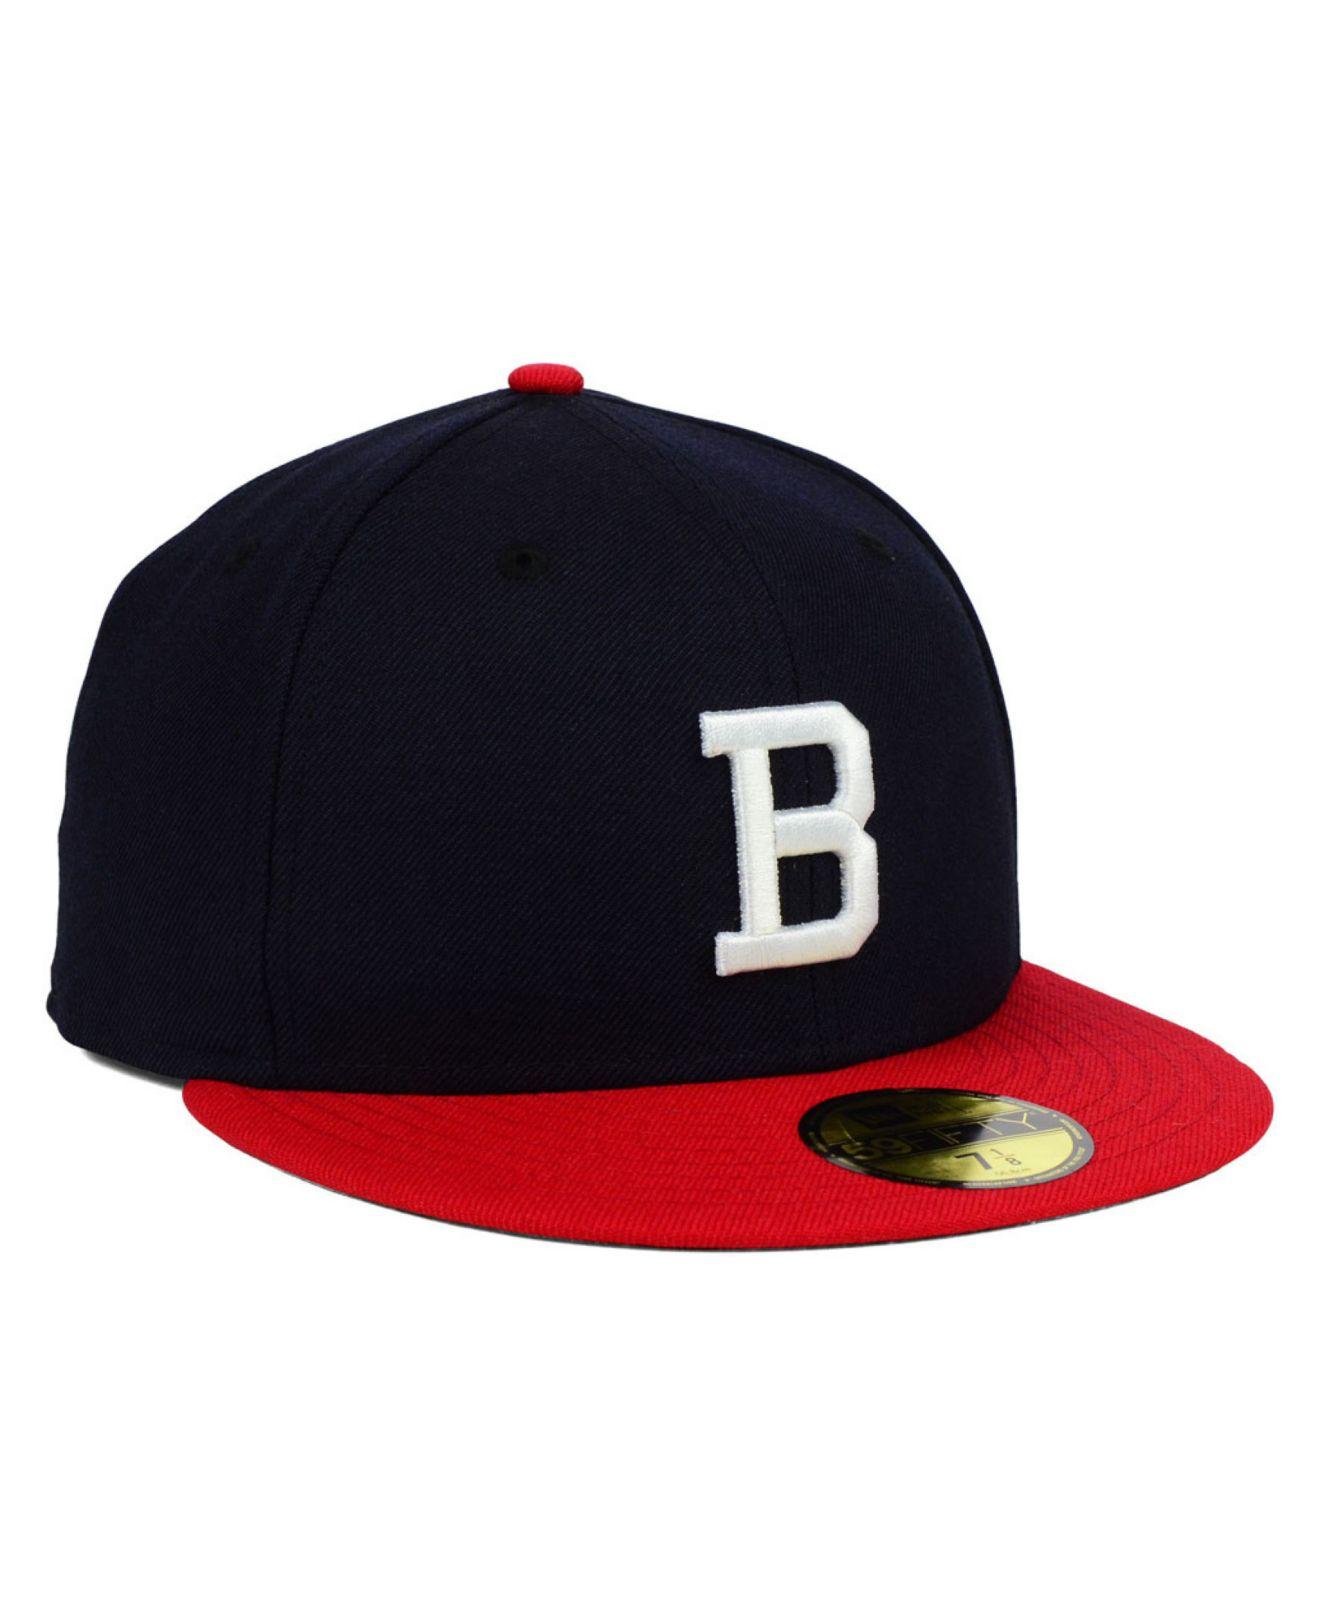 best website 58a19 f3703 ... sale lyst ktz boston braves cooperstown 59fifty cap in blue for men  41d62 5f020